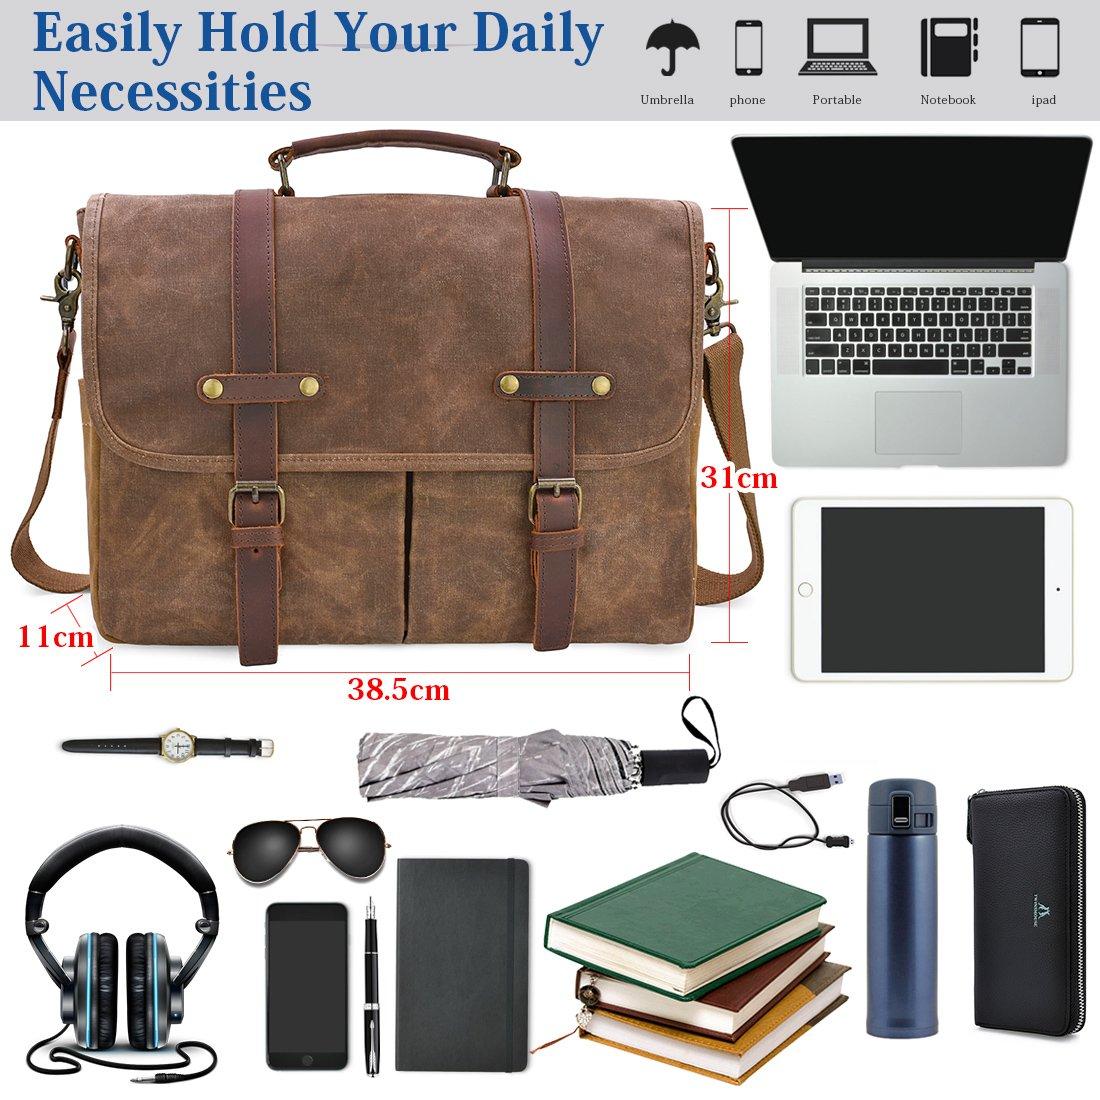 Newhey Mens Laptop Shoulder Canvas Messenger Bag Waterproof Computer  Briefcase Notebook Vintage Satchel Designer School Work Bags Brown 15.6  Leather  ... c0b07a67826e4